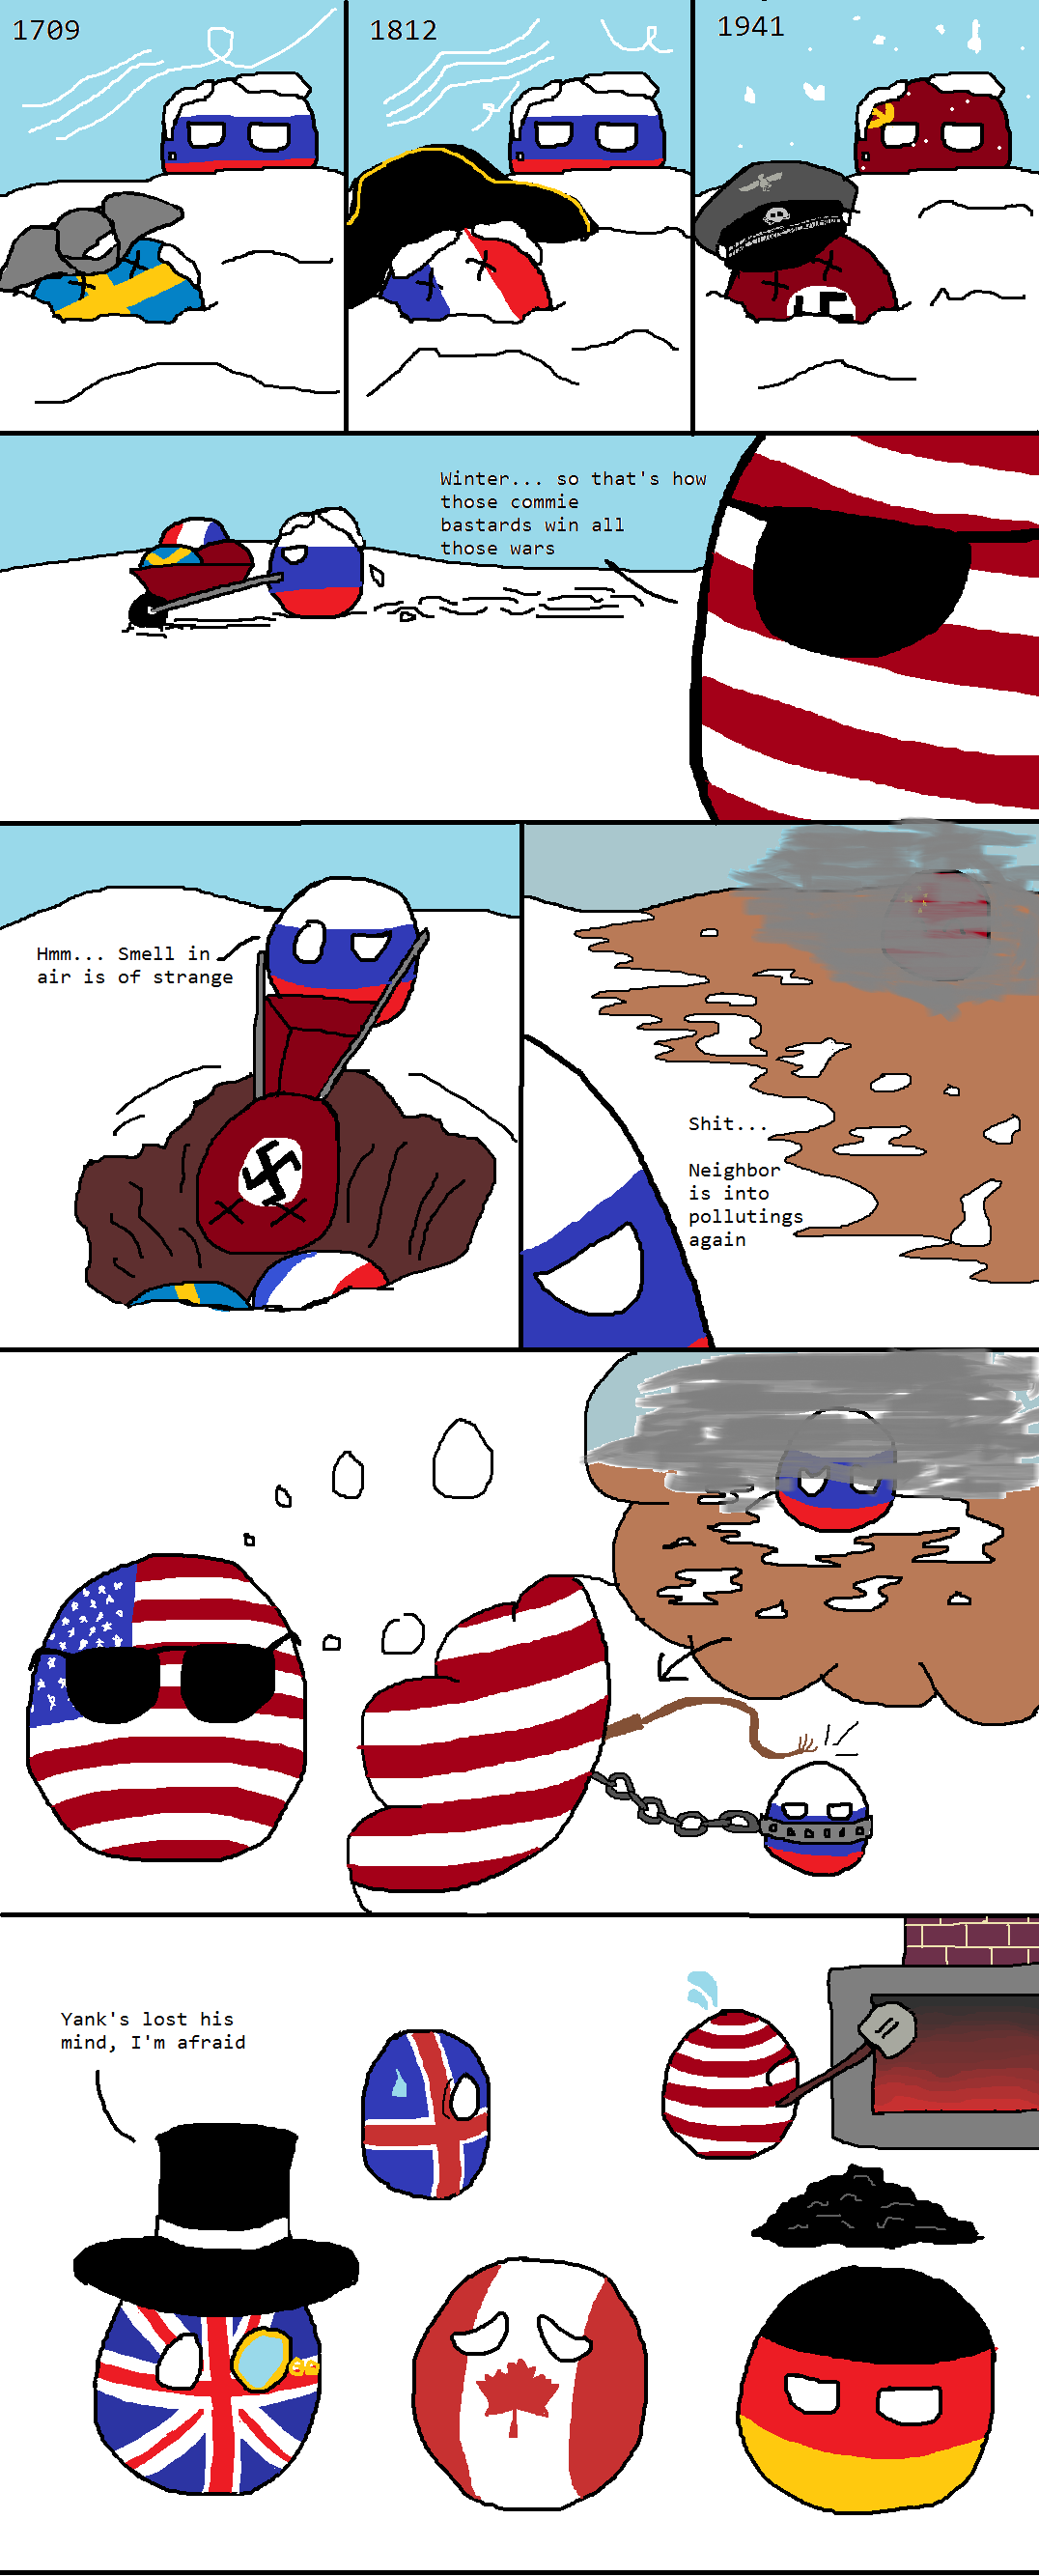 America hatches a plot